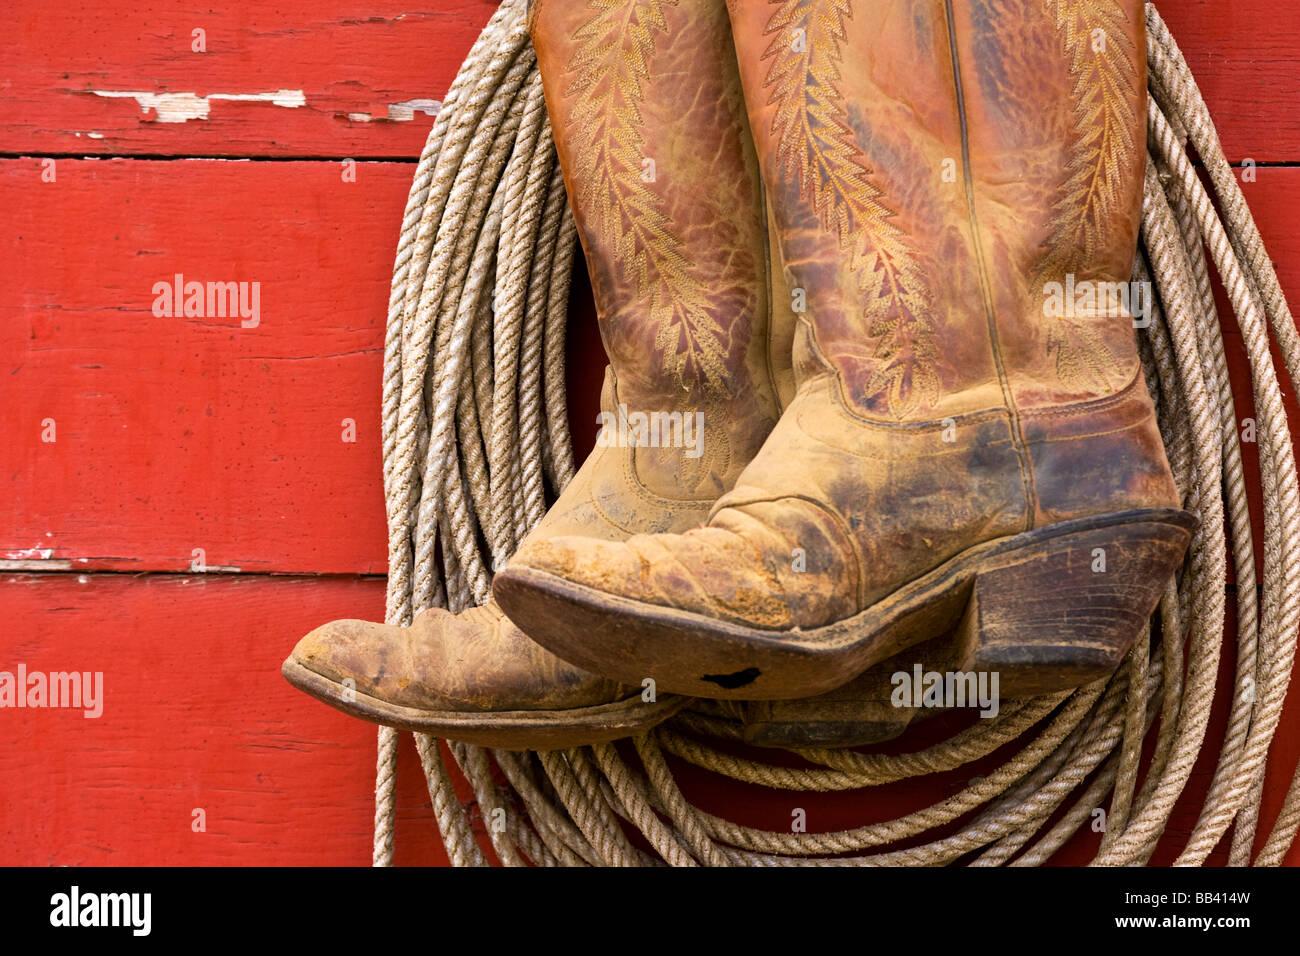 lasso cowboy close up stock photos lasso cowboy close up stock usa oregon seneca ponderosa ranch close up of cowboy boots and